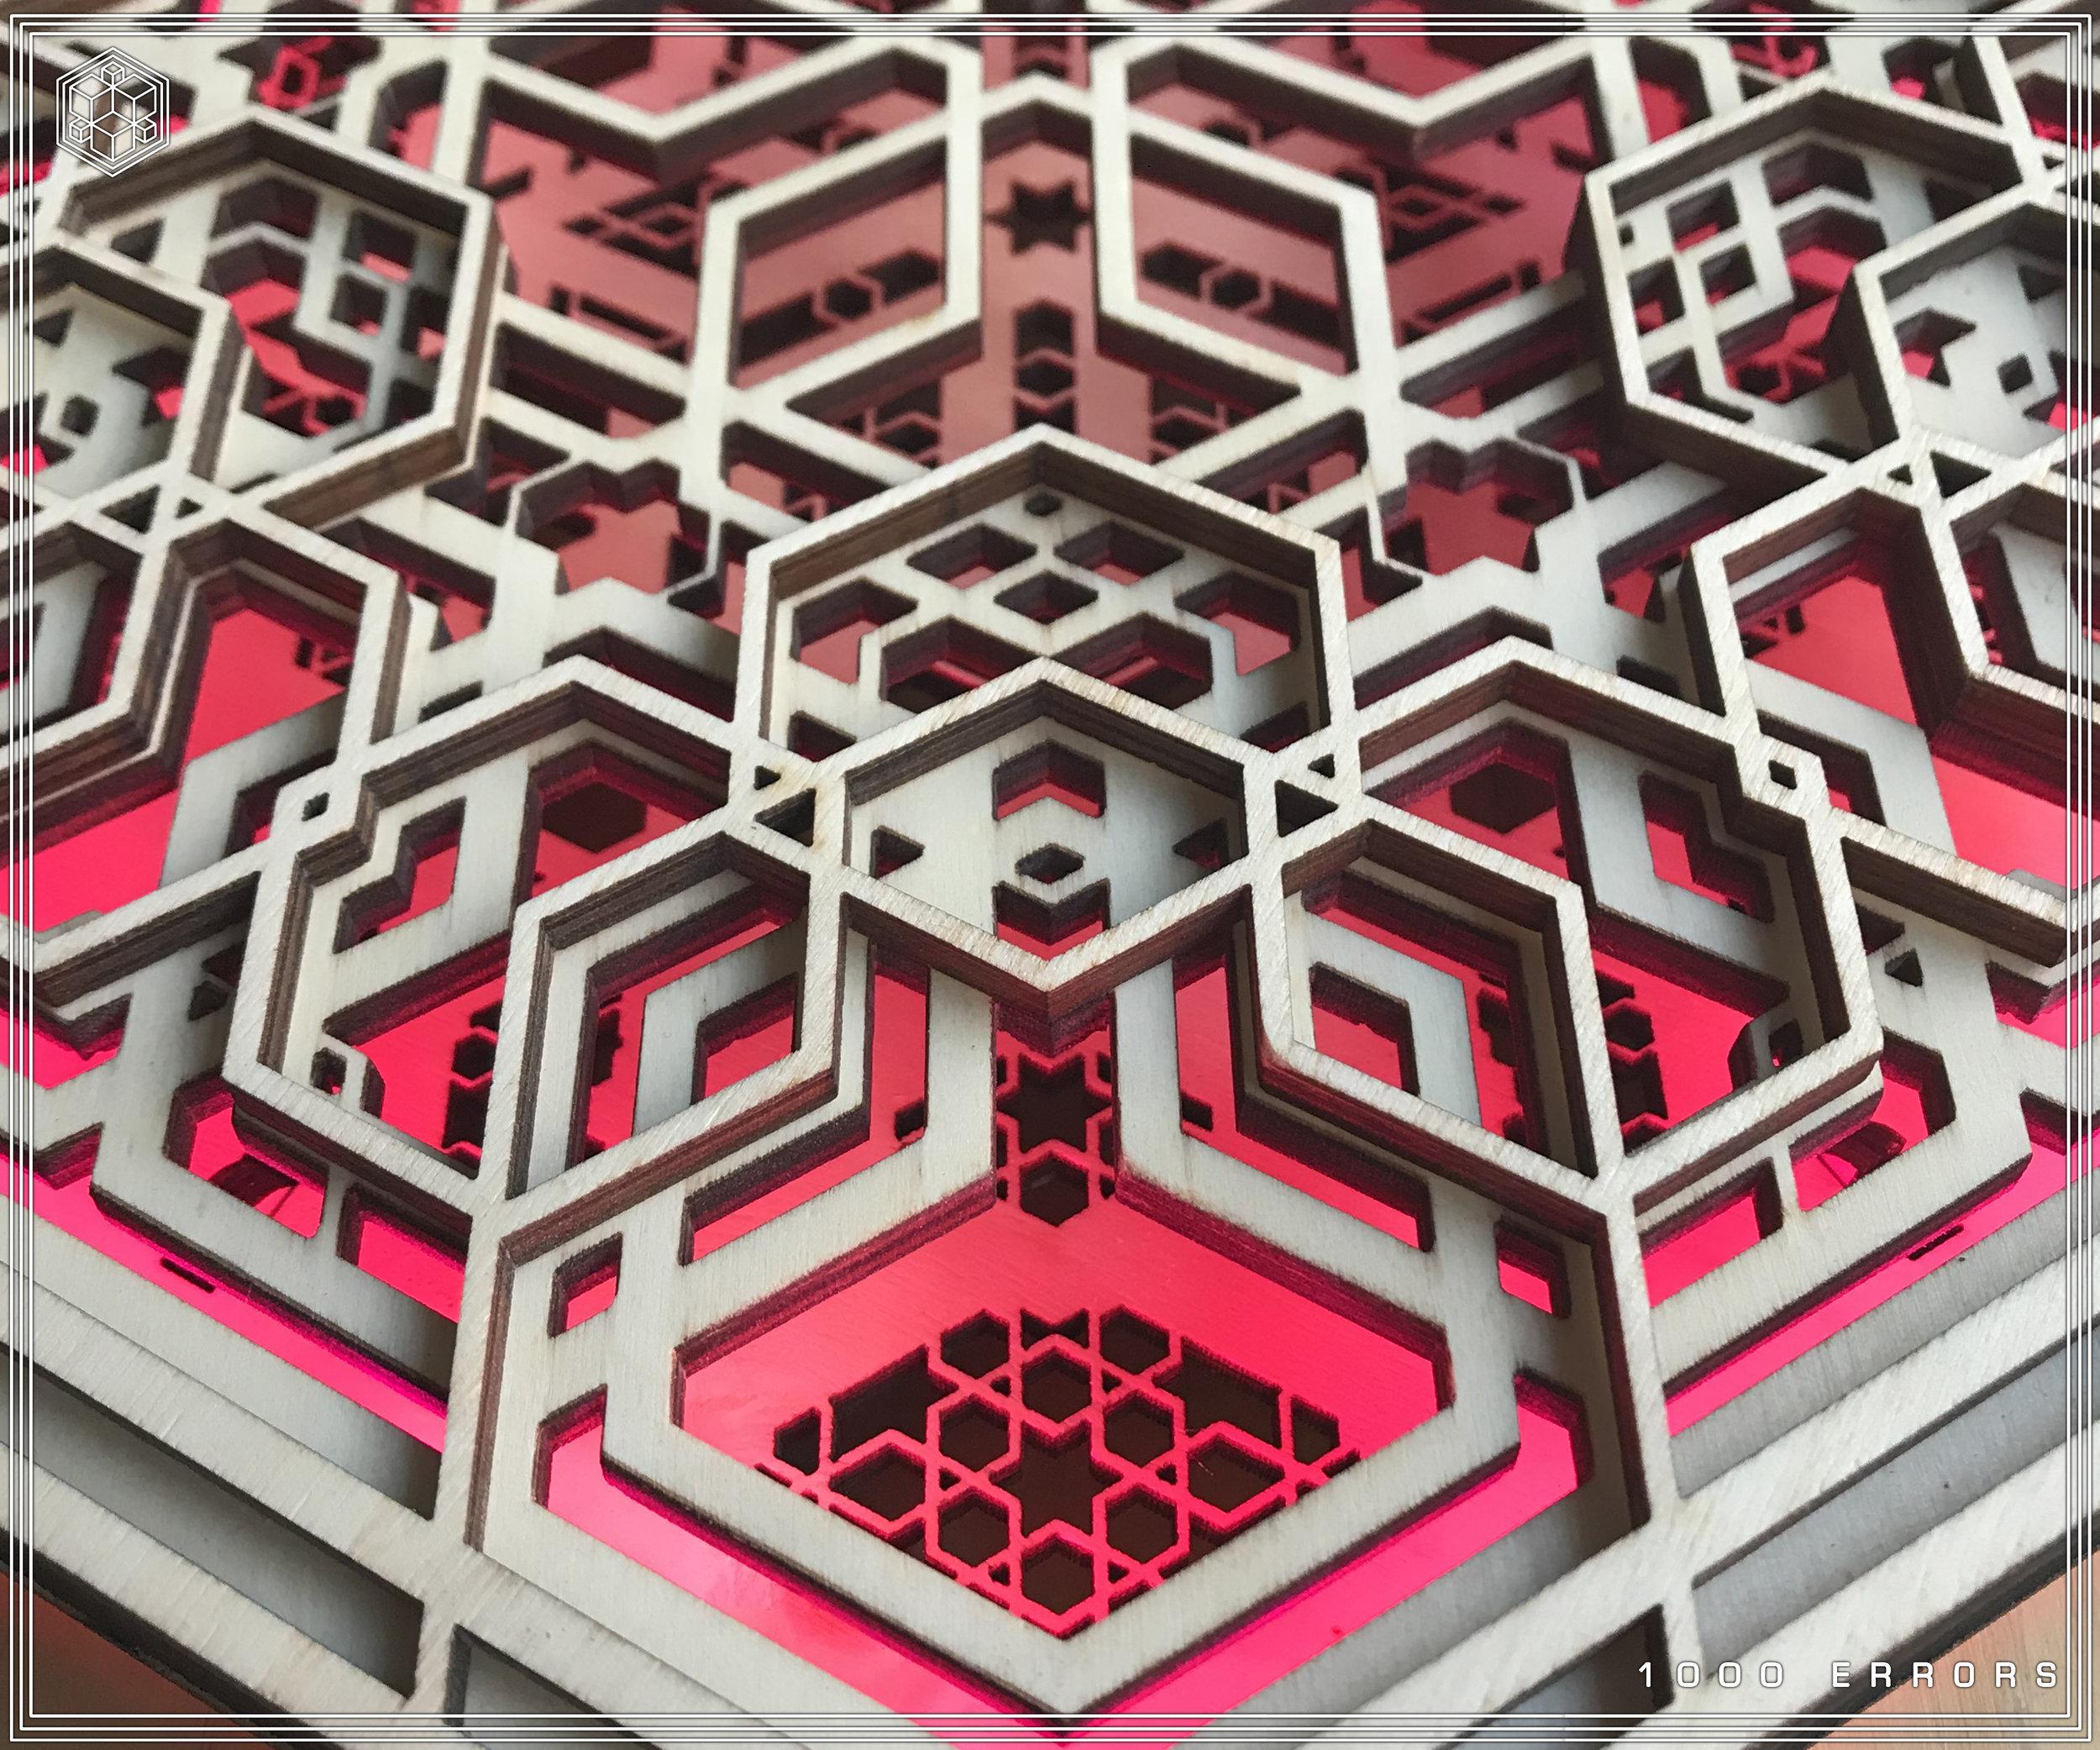 Geometric, wood, woodwork, cnc, cad, maya, rhino, procedural, generative, geometry, sacred,hexagon, platonic, solid, psy, psychedelic, art, clock, shop, buy, sale, store, discount,metaphysical, spiritual, new38 .jpg